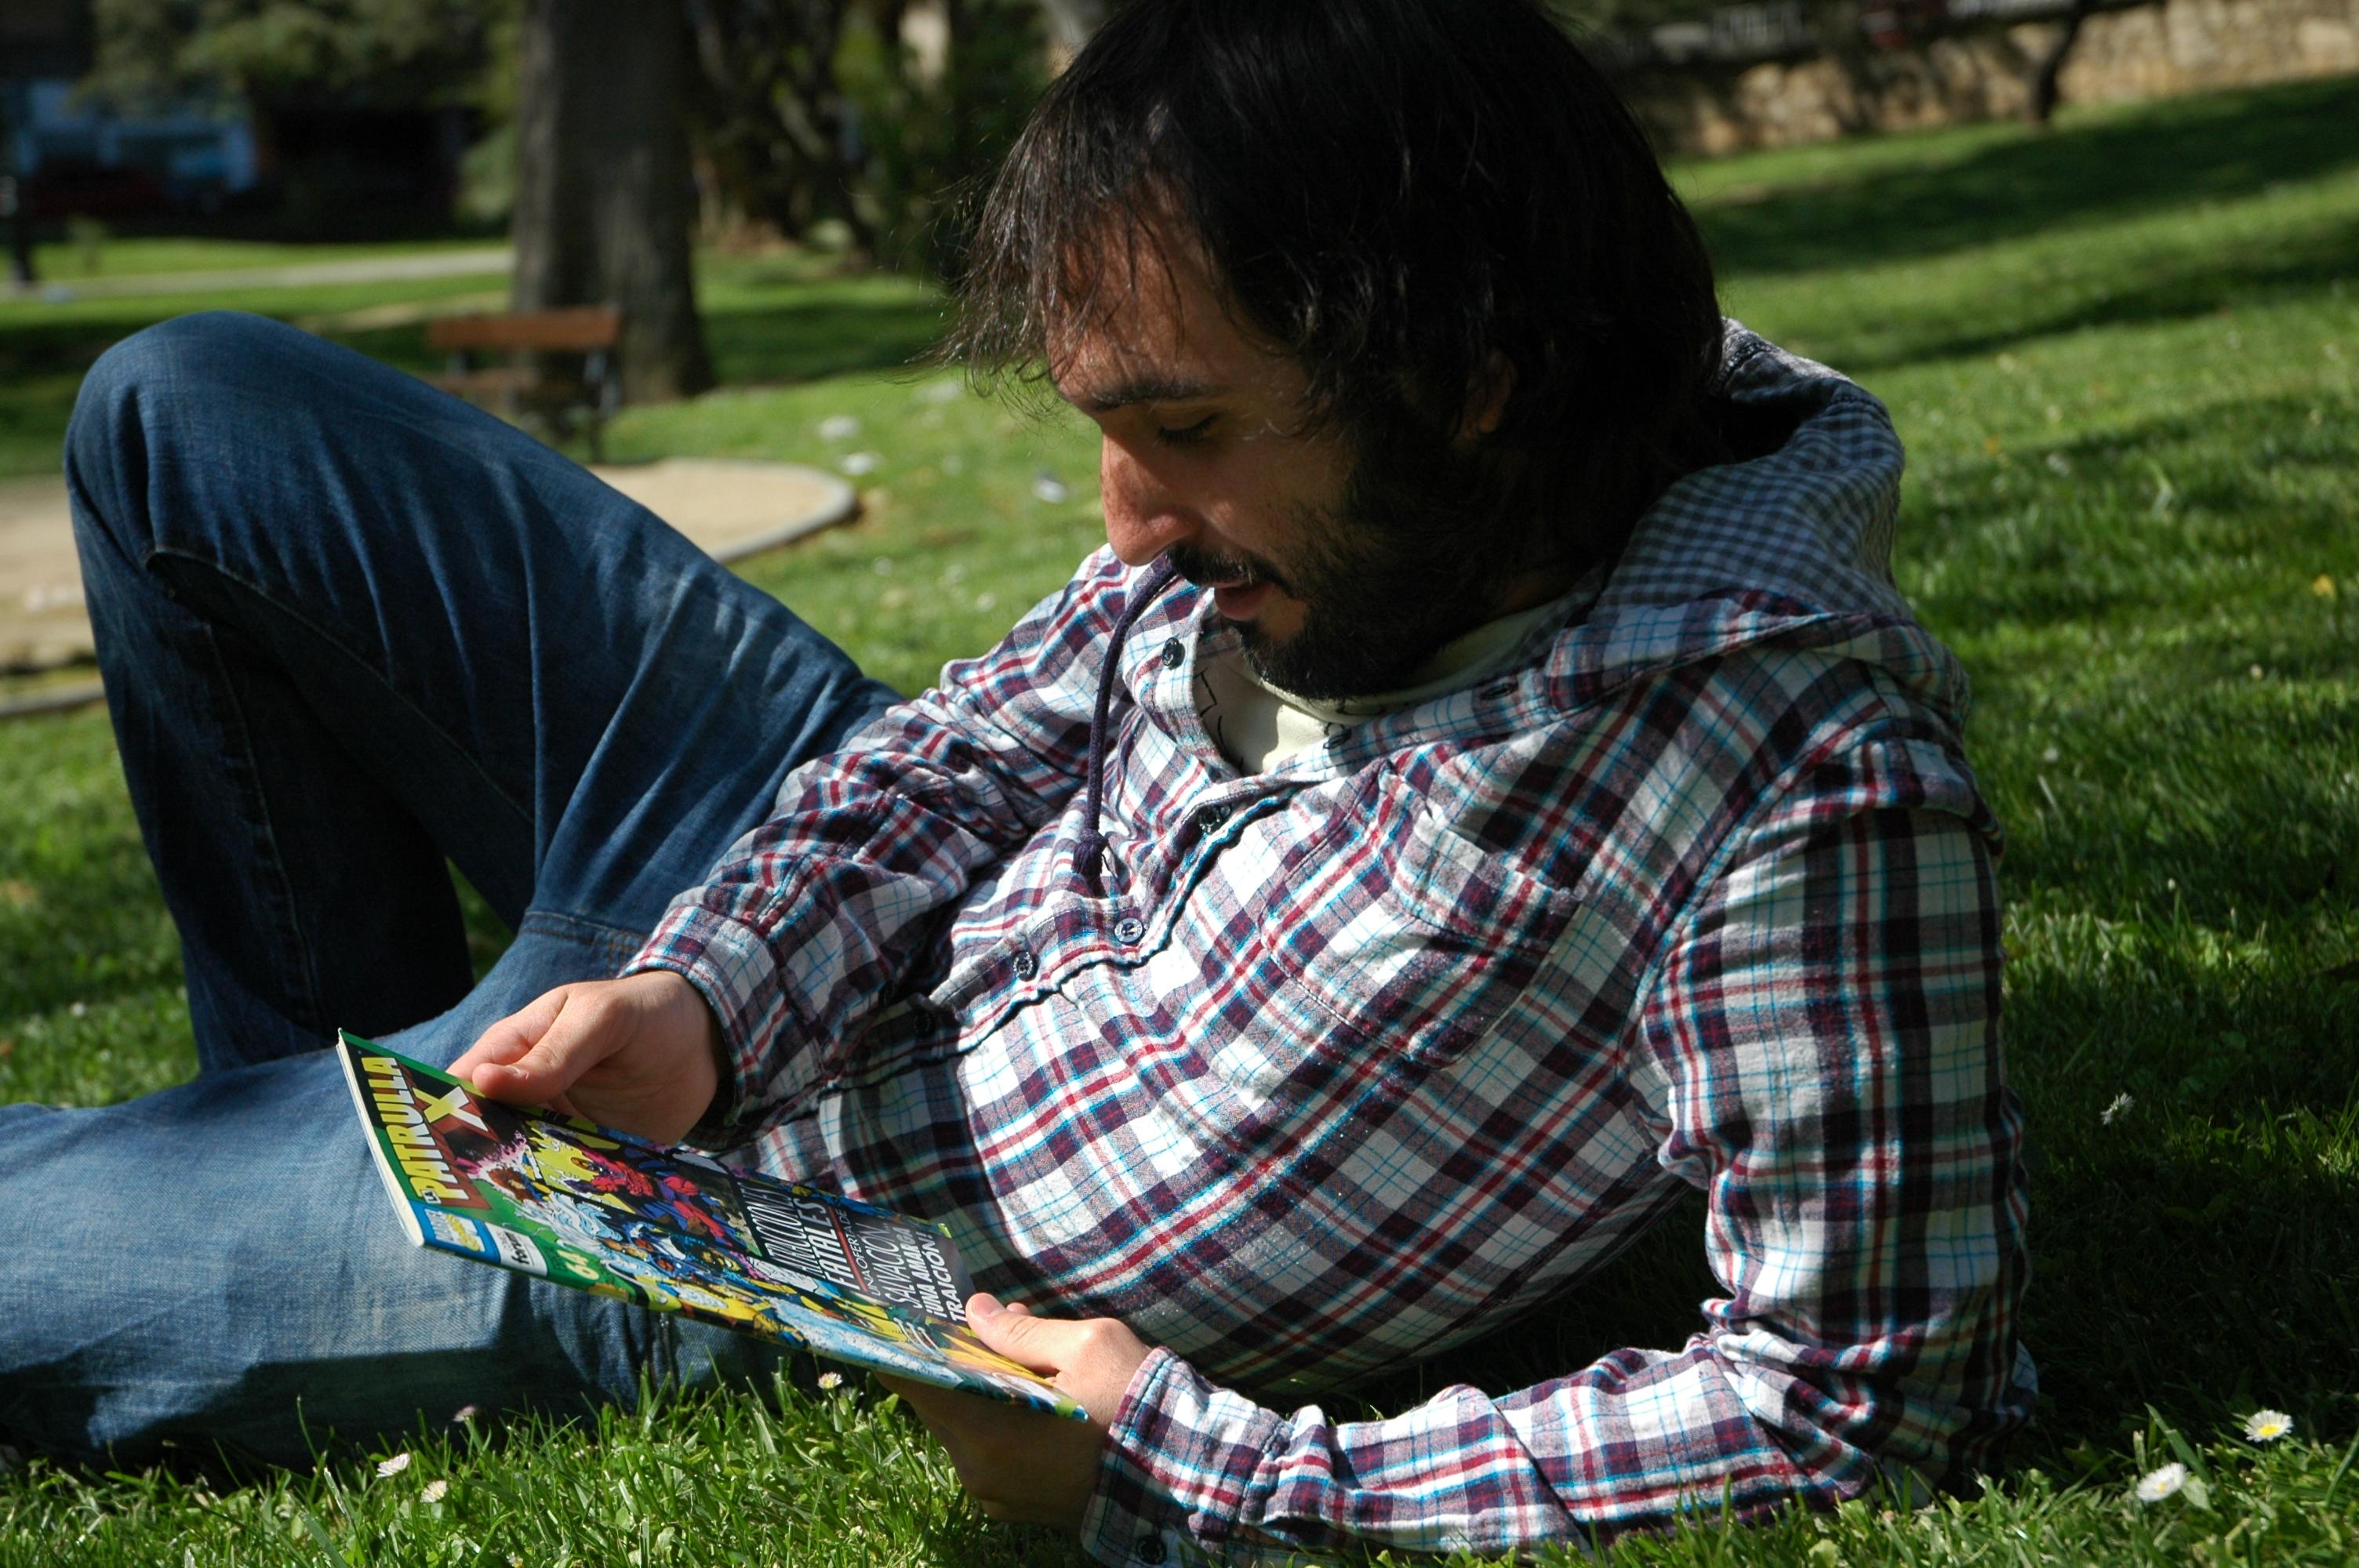 Book_1_David_Pallás_Gozalo_Parque_83